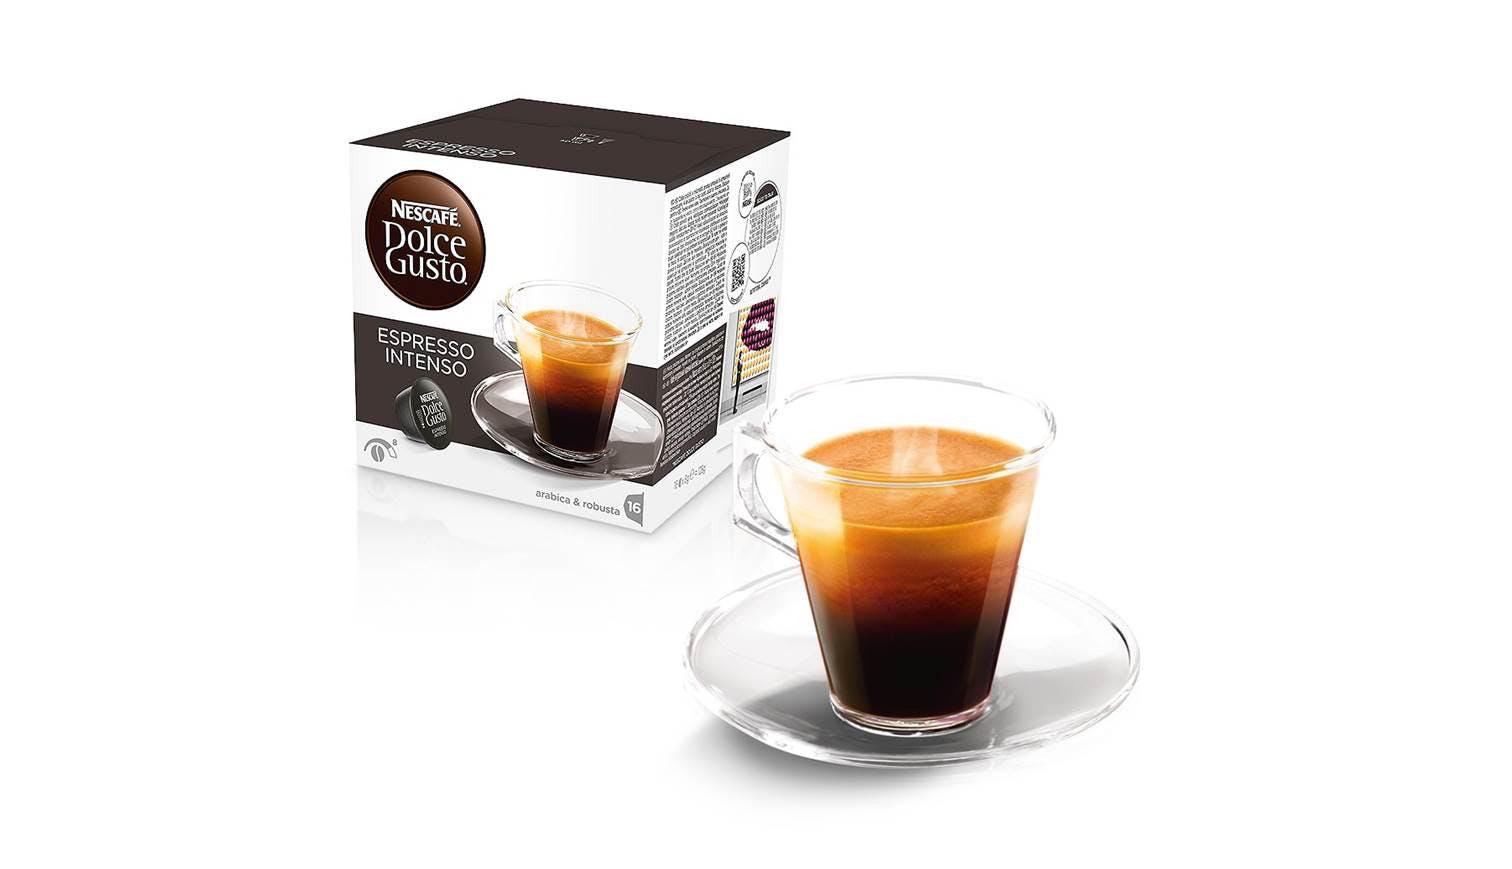 Nescafe DG Espresso Intenso PK3